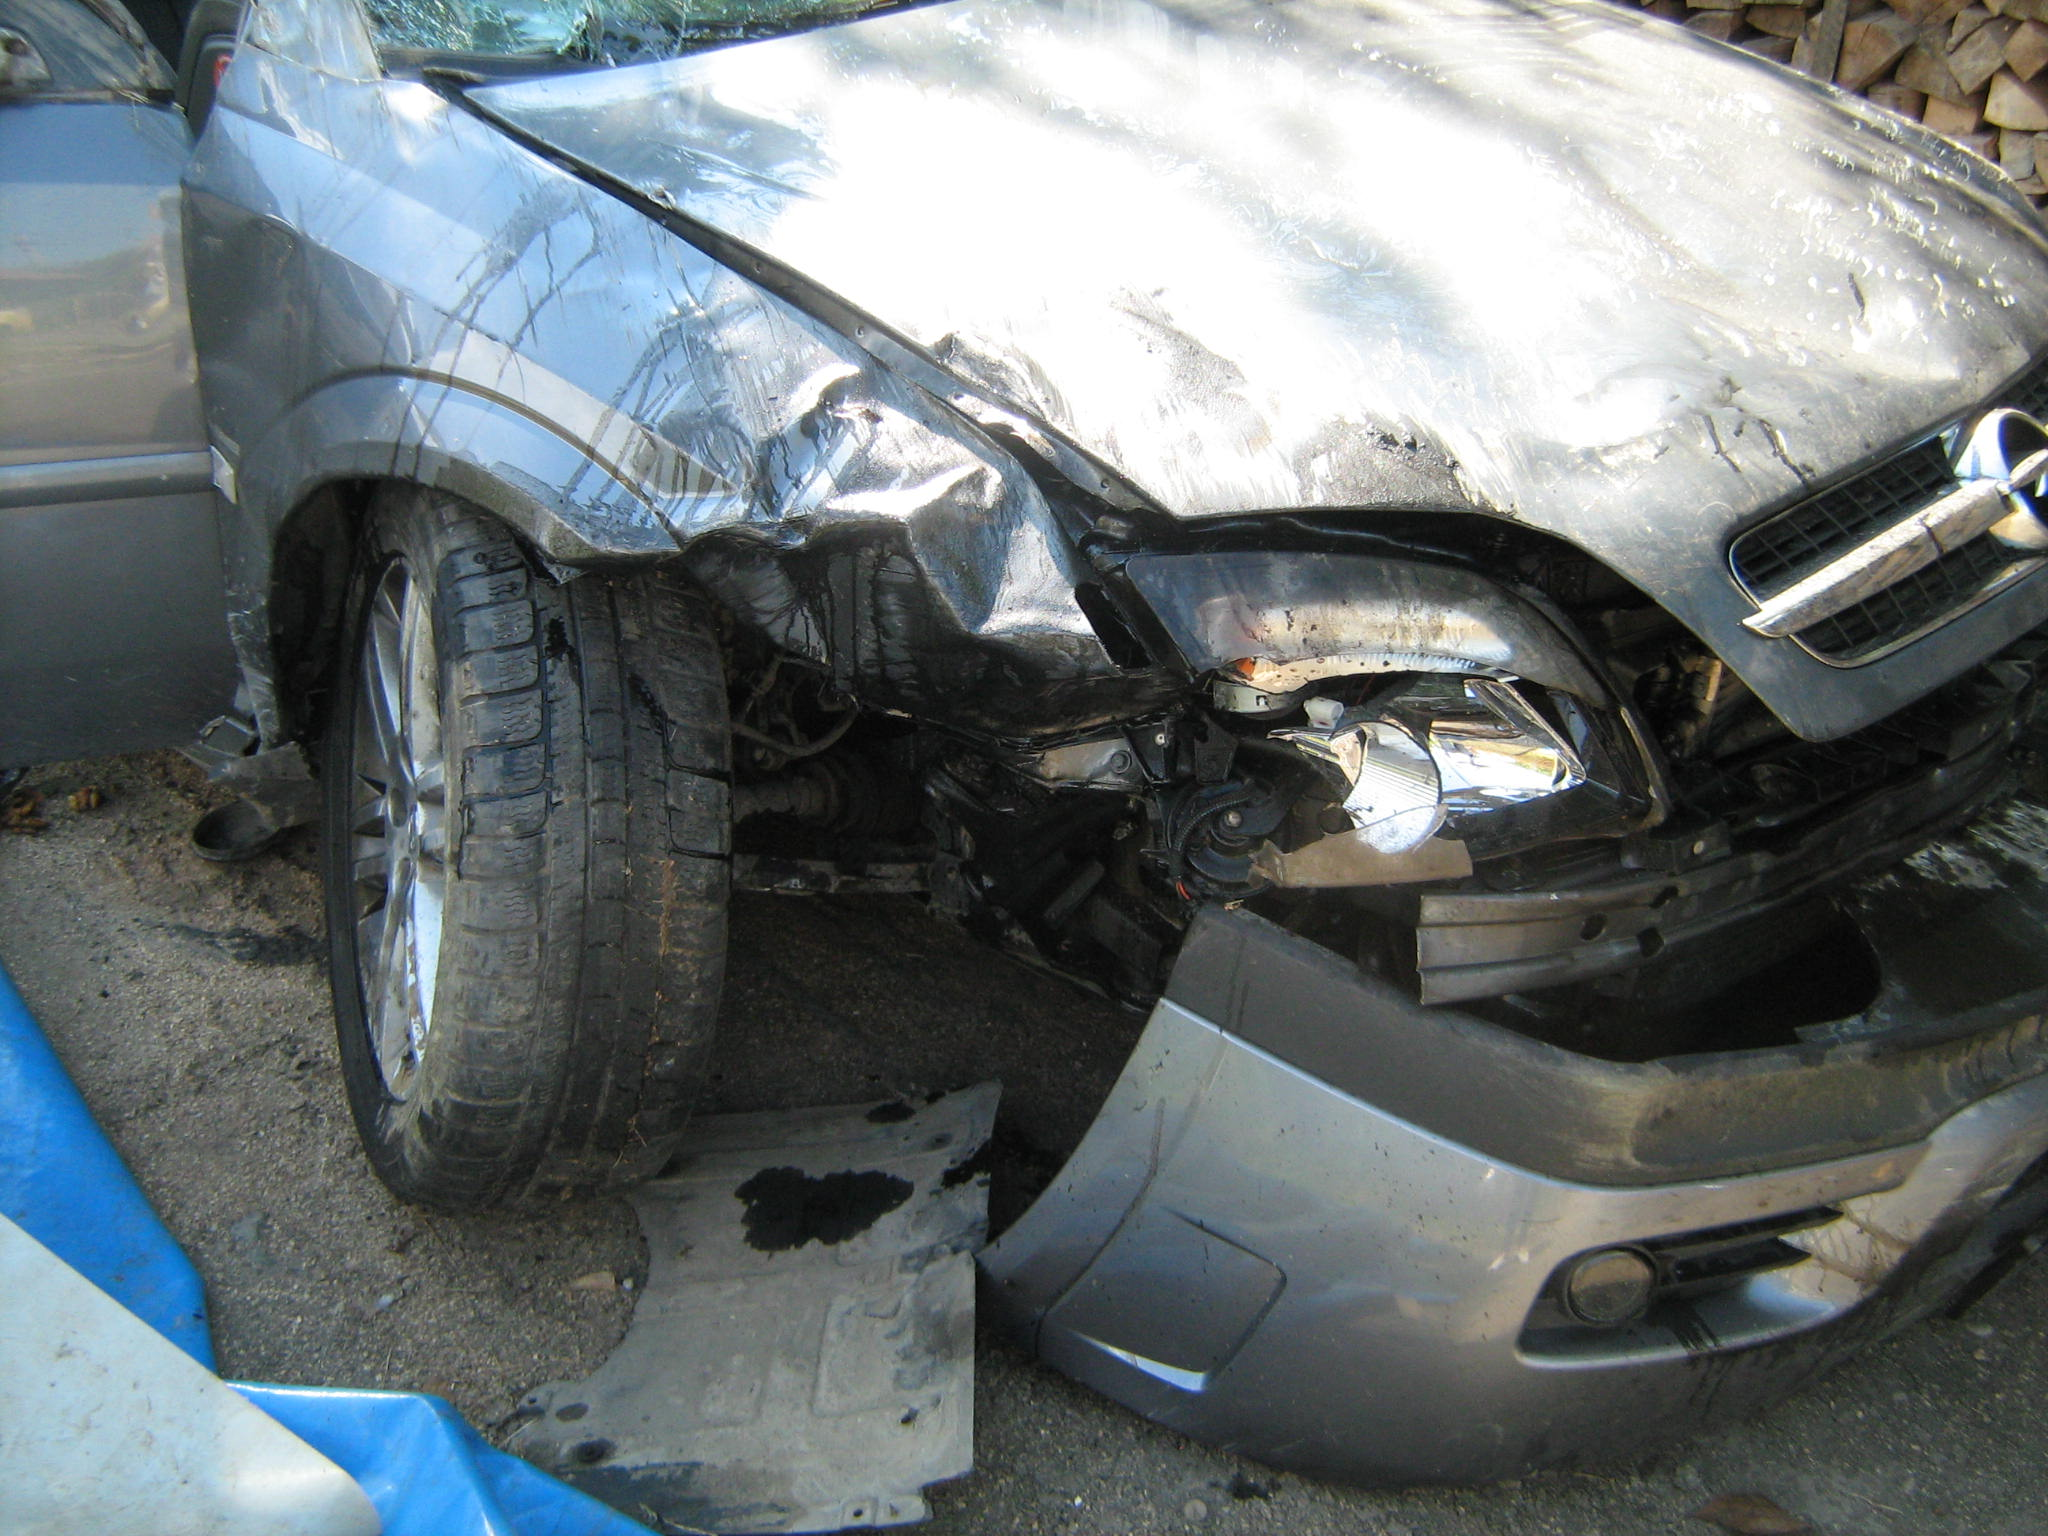 Opel Vectra avariat 2002 Diesel Hatchback - 30 Martie 2011 - Poza 1